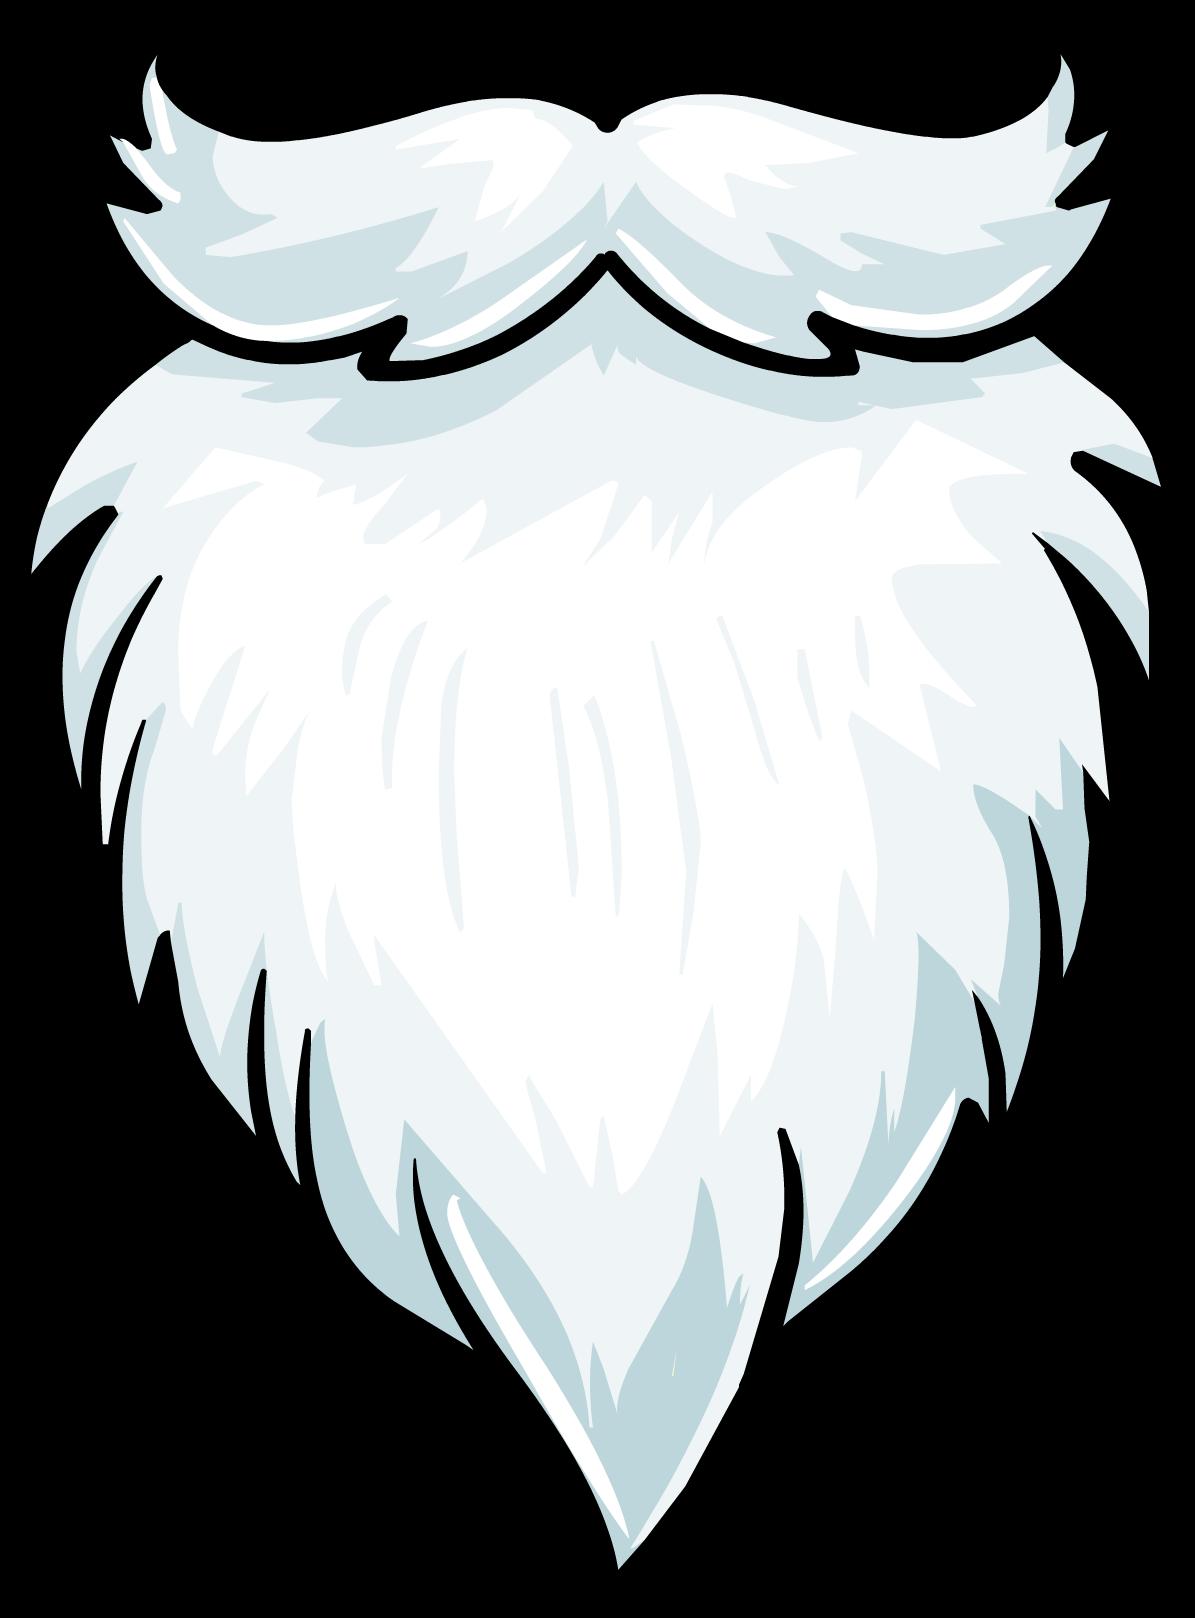 Santa beards four score. Beard clipart plain